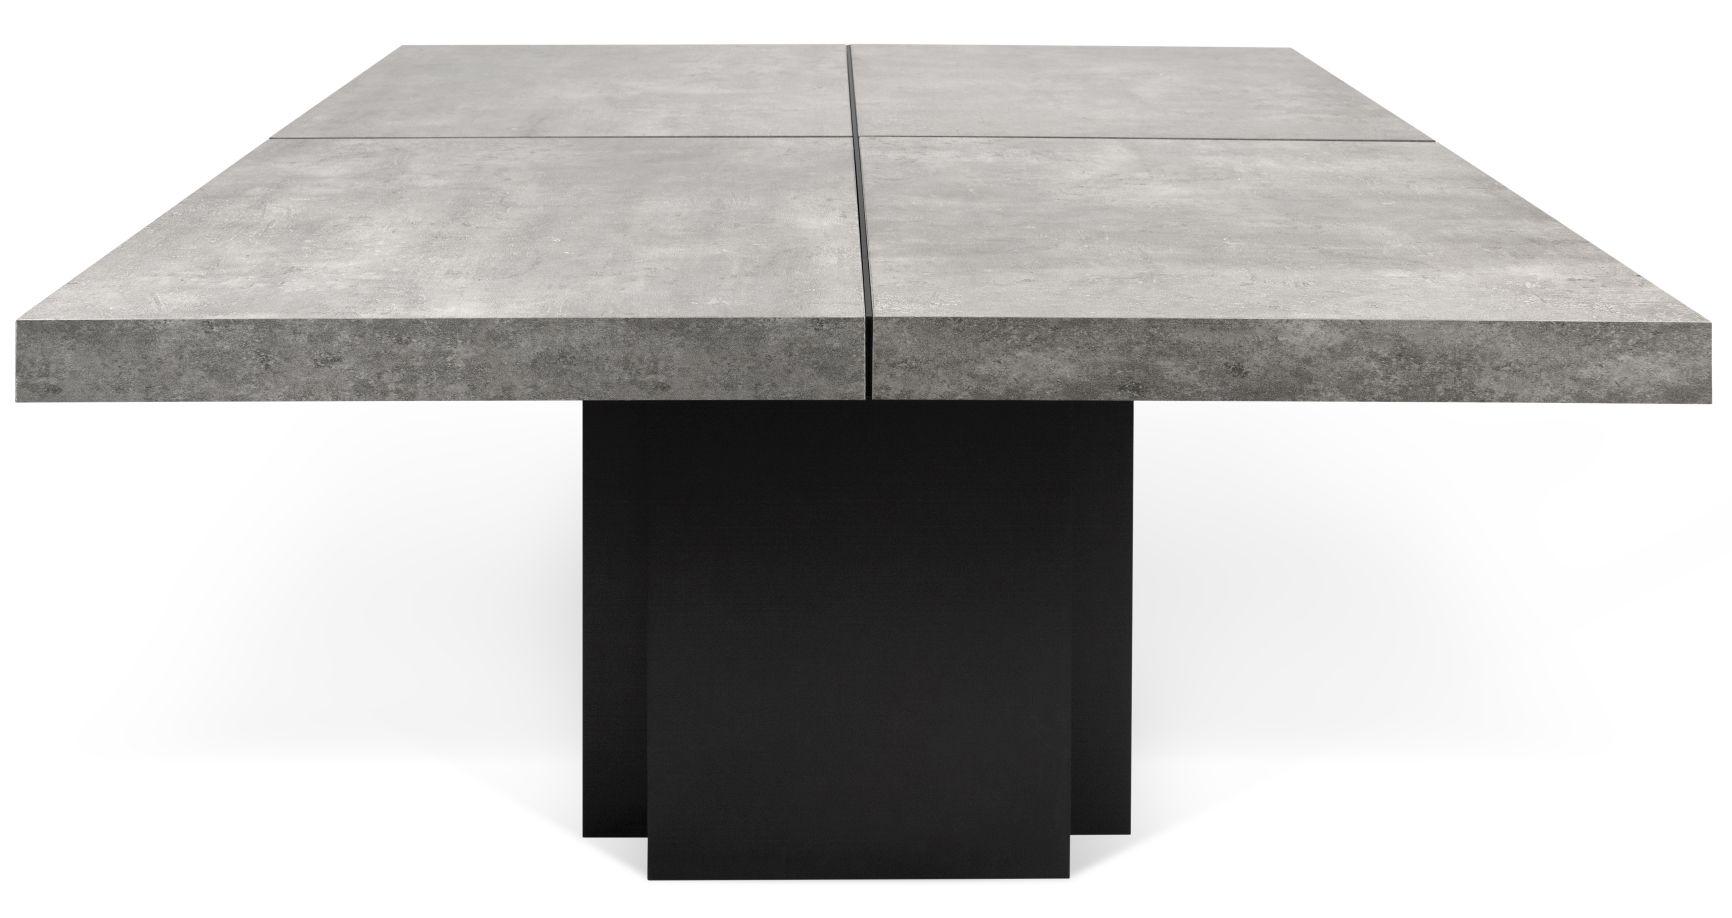 TemaHome Vierkante Tafel Dusk 130 - Grijs Tafelblad - Zwart Onderstel